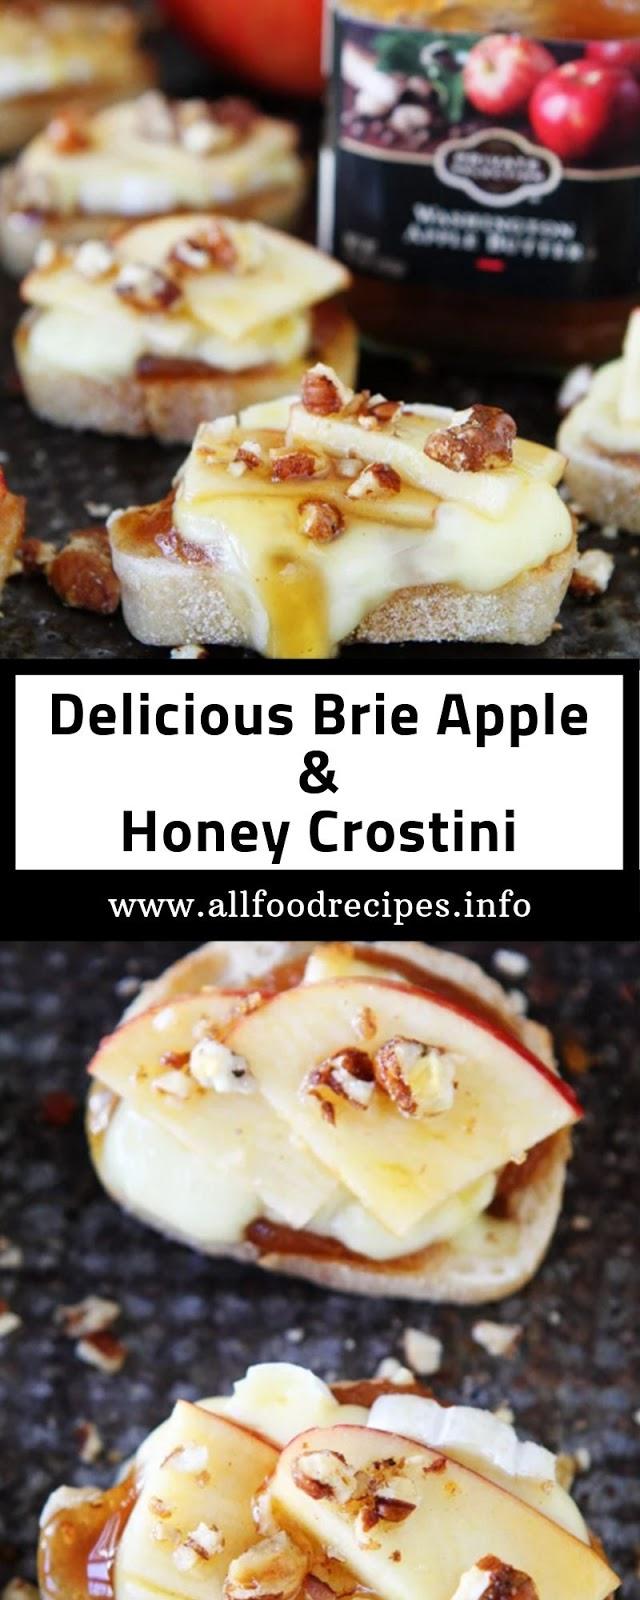 Delicious Brie Apple & Honey Crostini